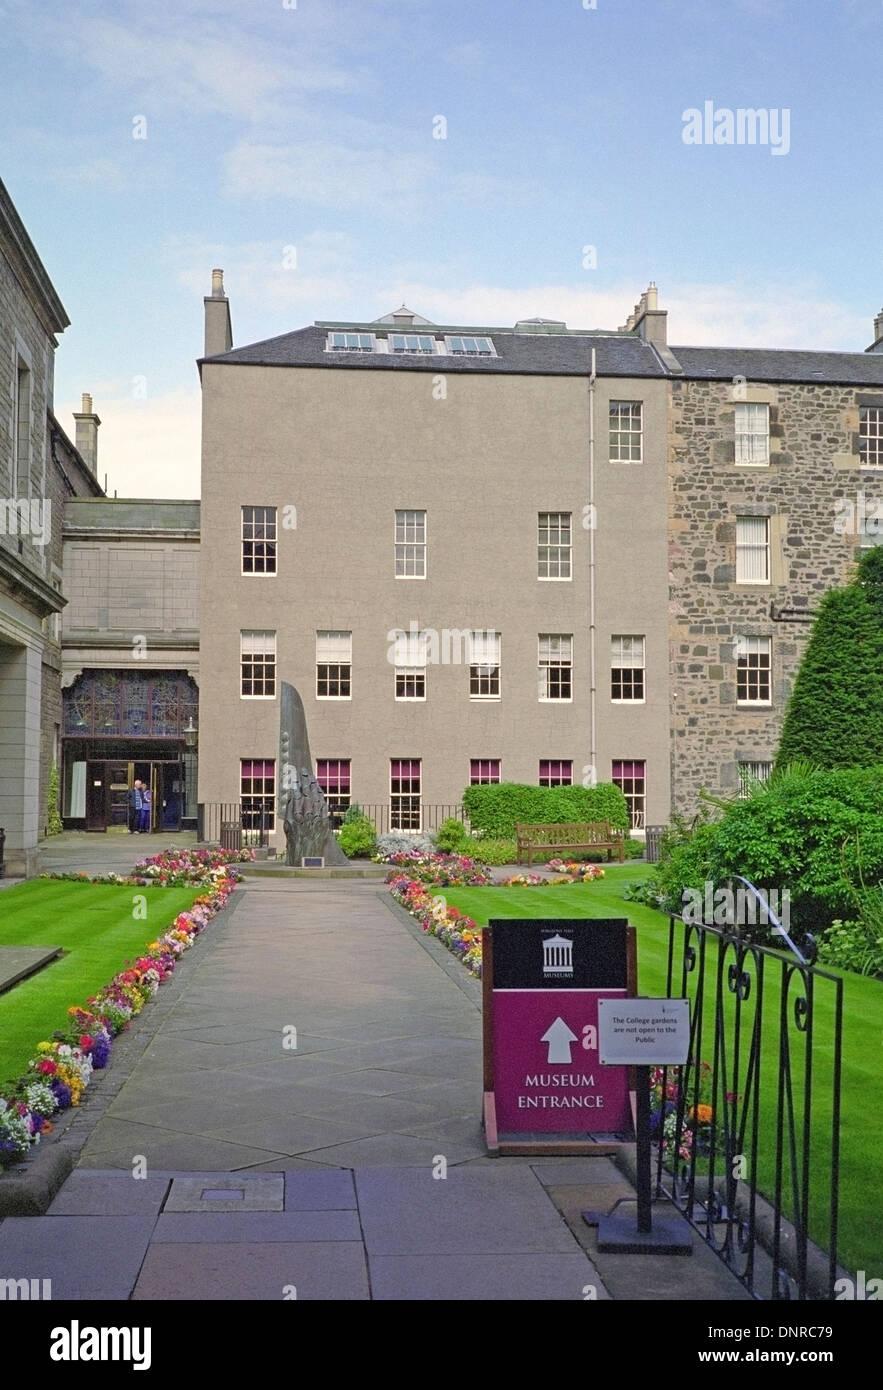 Surgeons' Hall Museums, The Royal College of Surgeons of Edinburgh, Nicholson Street, Edinburgh, Scotland, UK - Stock Image